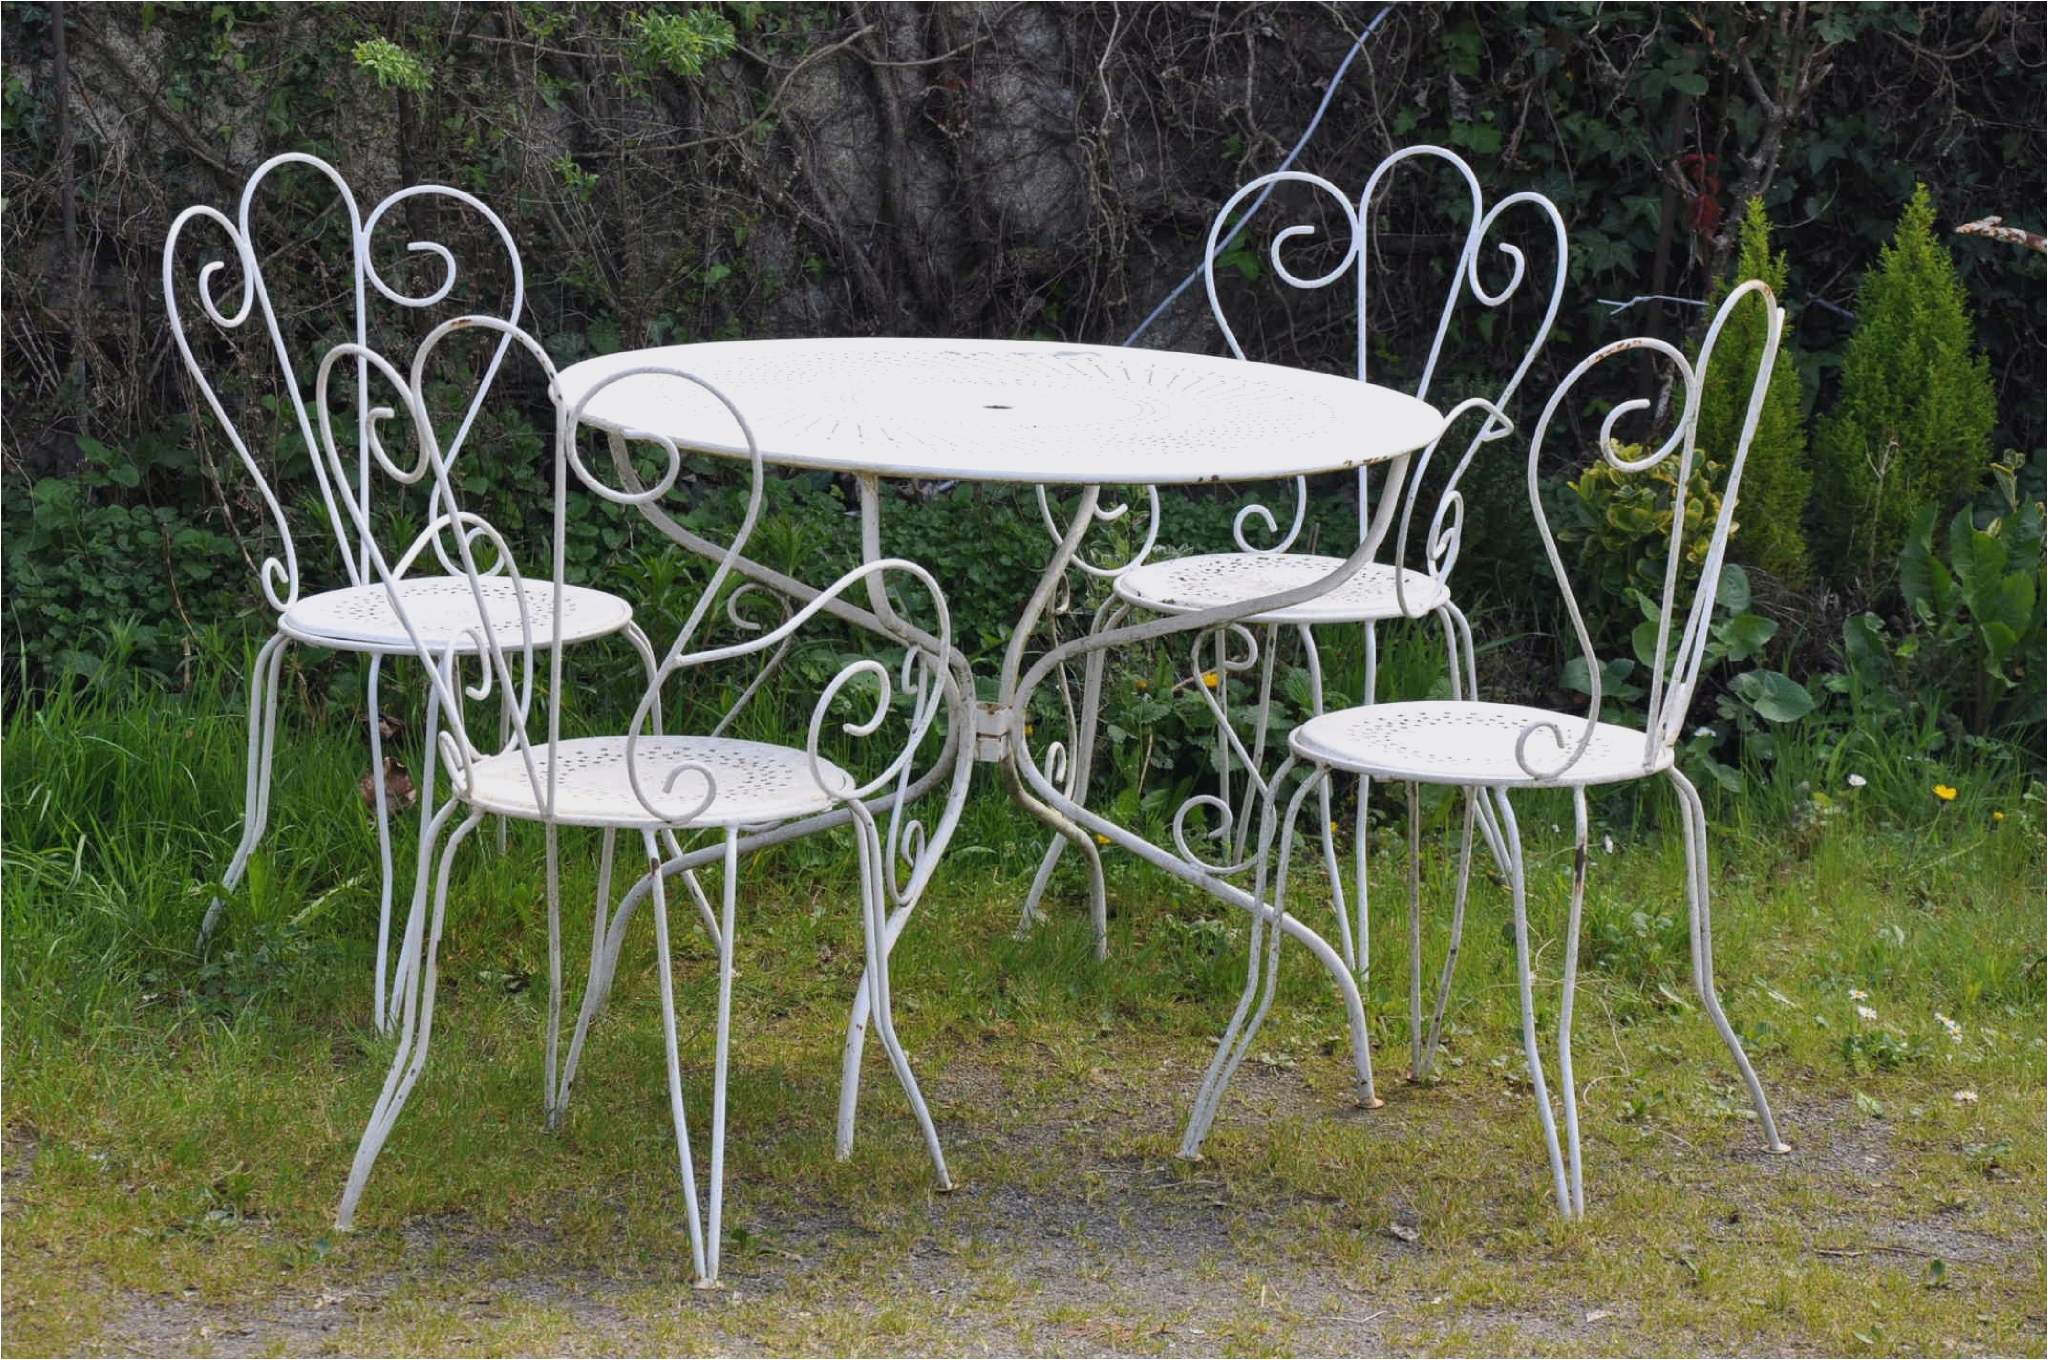 Table Kettler solde Impressionnant Photos 15 Impressionnant Salon De Jardin Kettler Galerie De Cuisine